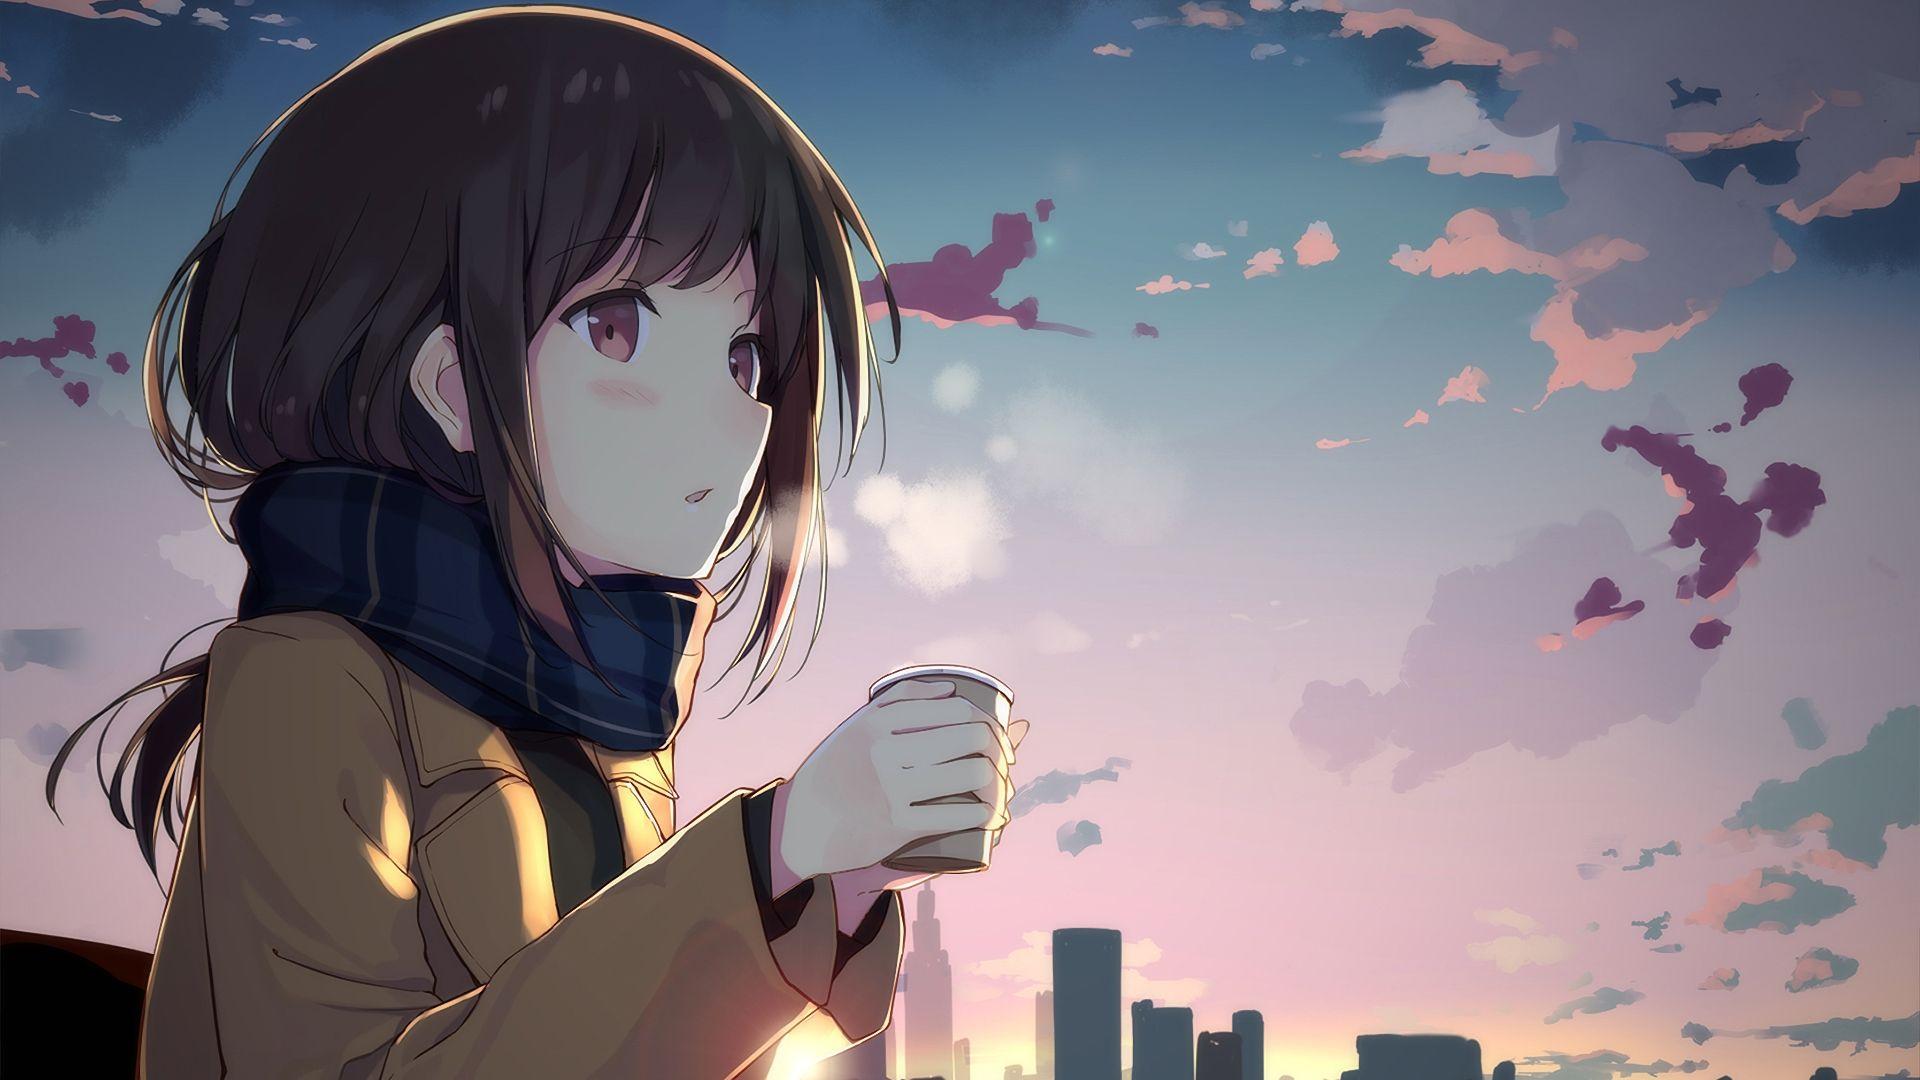 Desktop Wallpaper Cute Anime Girl Drinking Coffee Anime